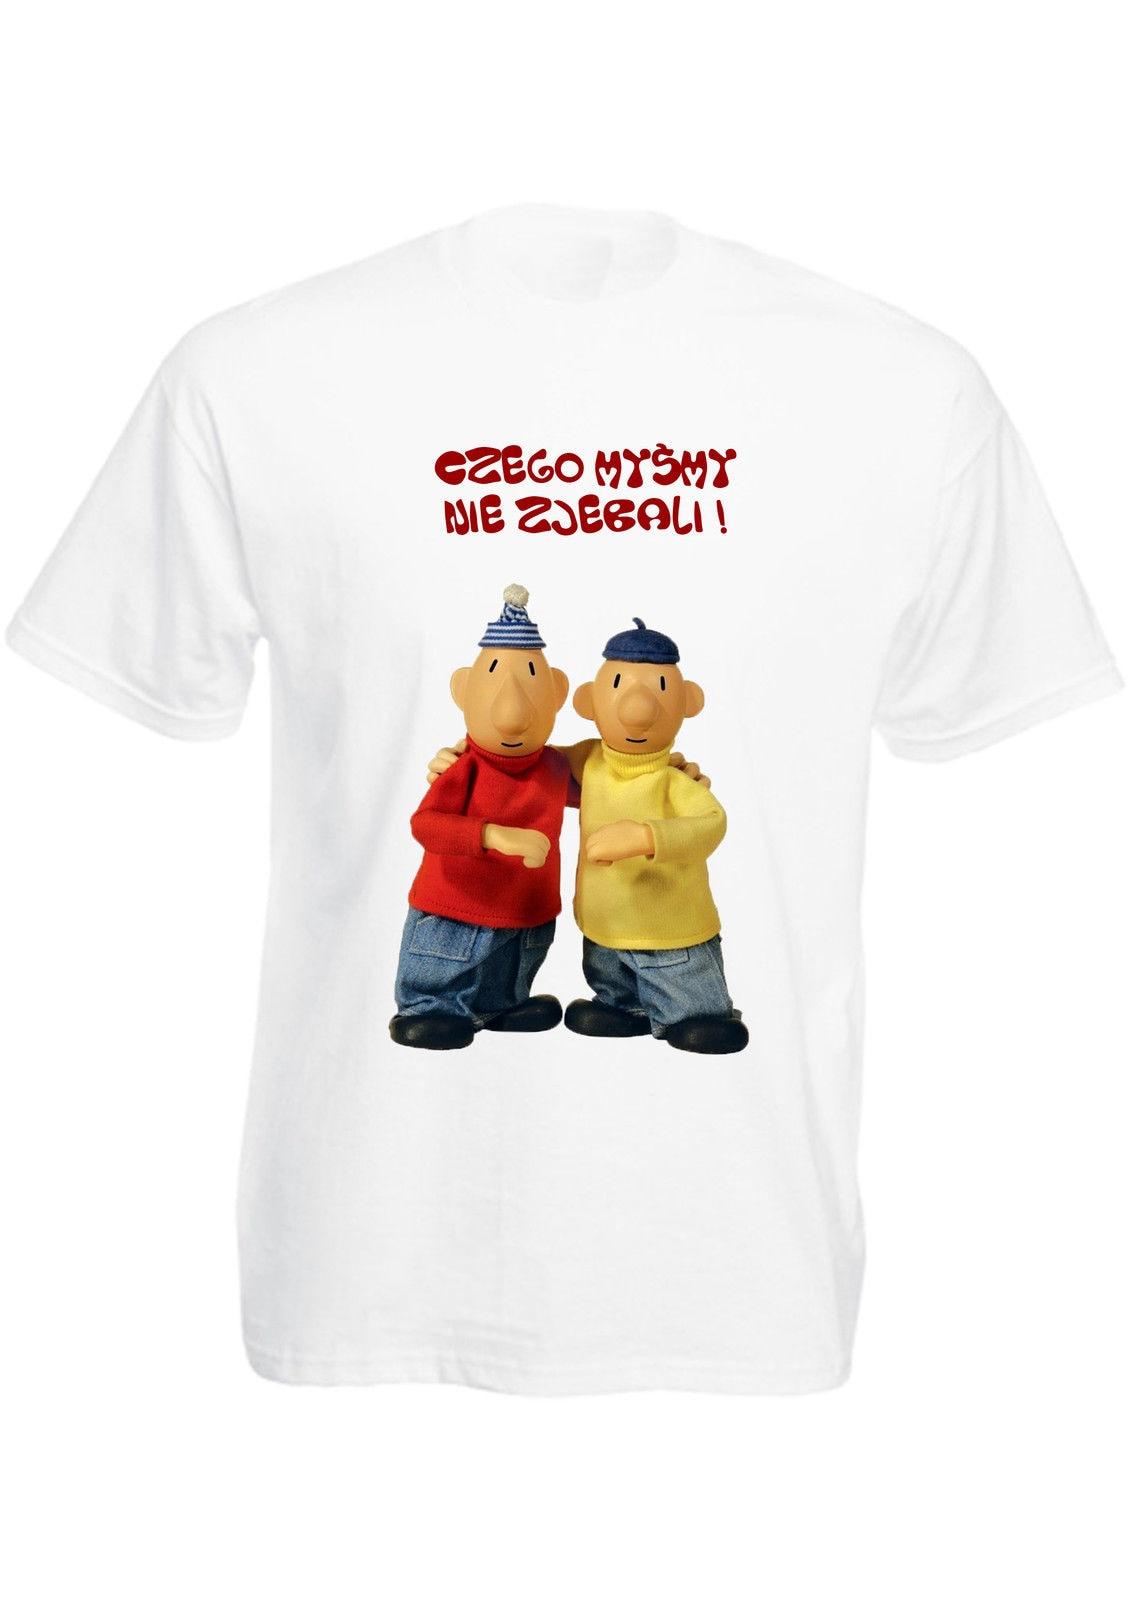 POLAND Koszulka smieszna Polish T-shirt Polska bajki prl prezent sasiedzi Pat New Fashion Casual Cotton Short-Sleeve feyenoord